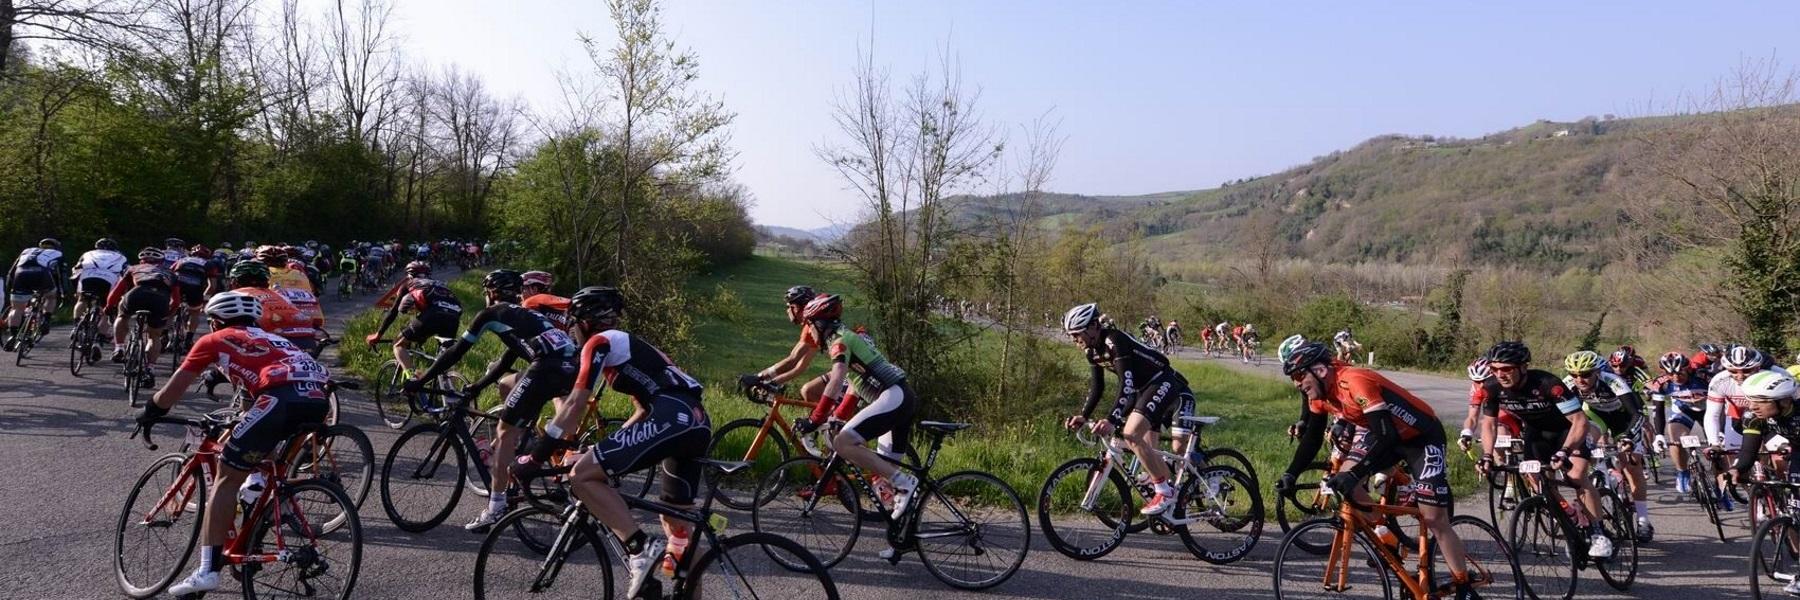 Granfondo La Route du Sel - Sportur Bicycle Expo